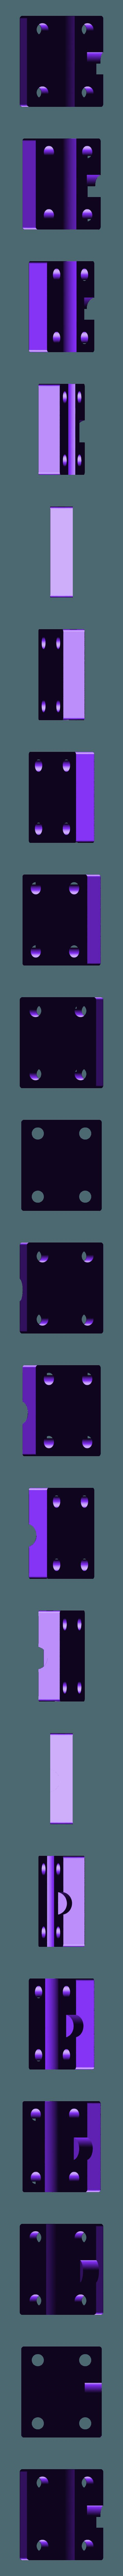 rod_bracket_motor_side.stl Download free STL file FDM Printer de Kleine Reus 300x300x900 • 3D printable object, Job